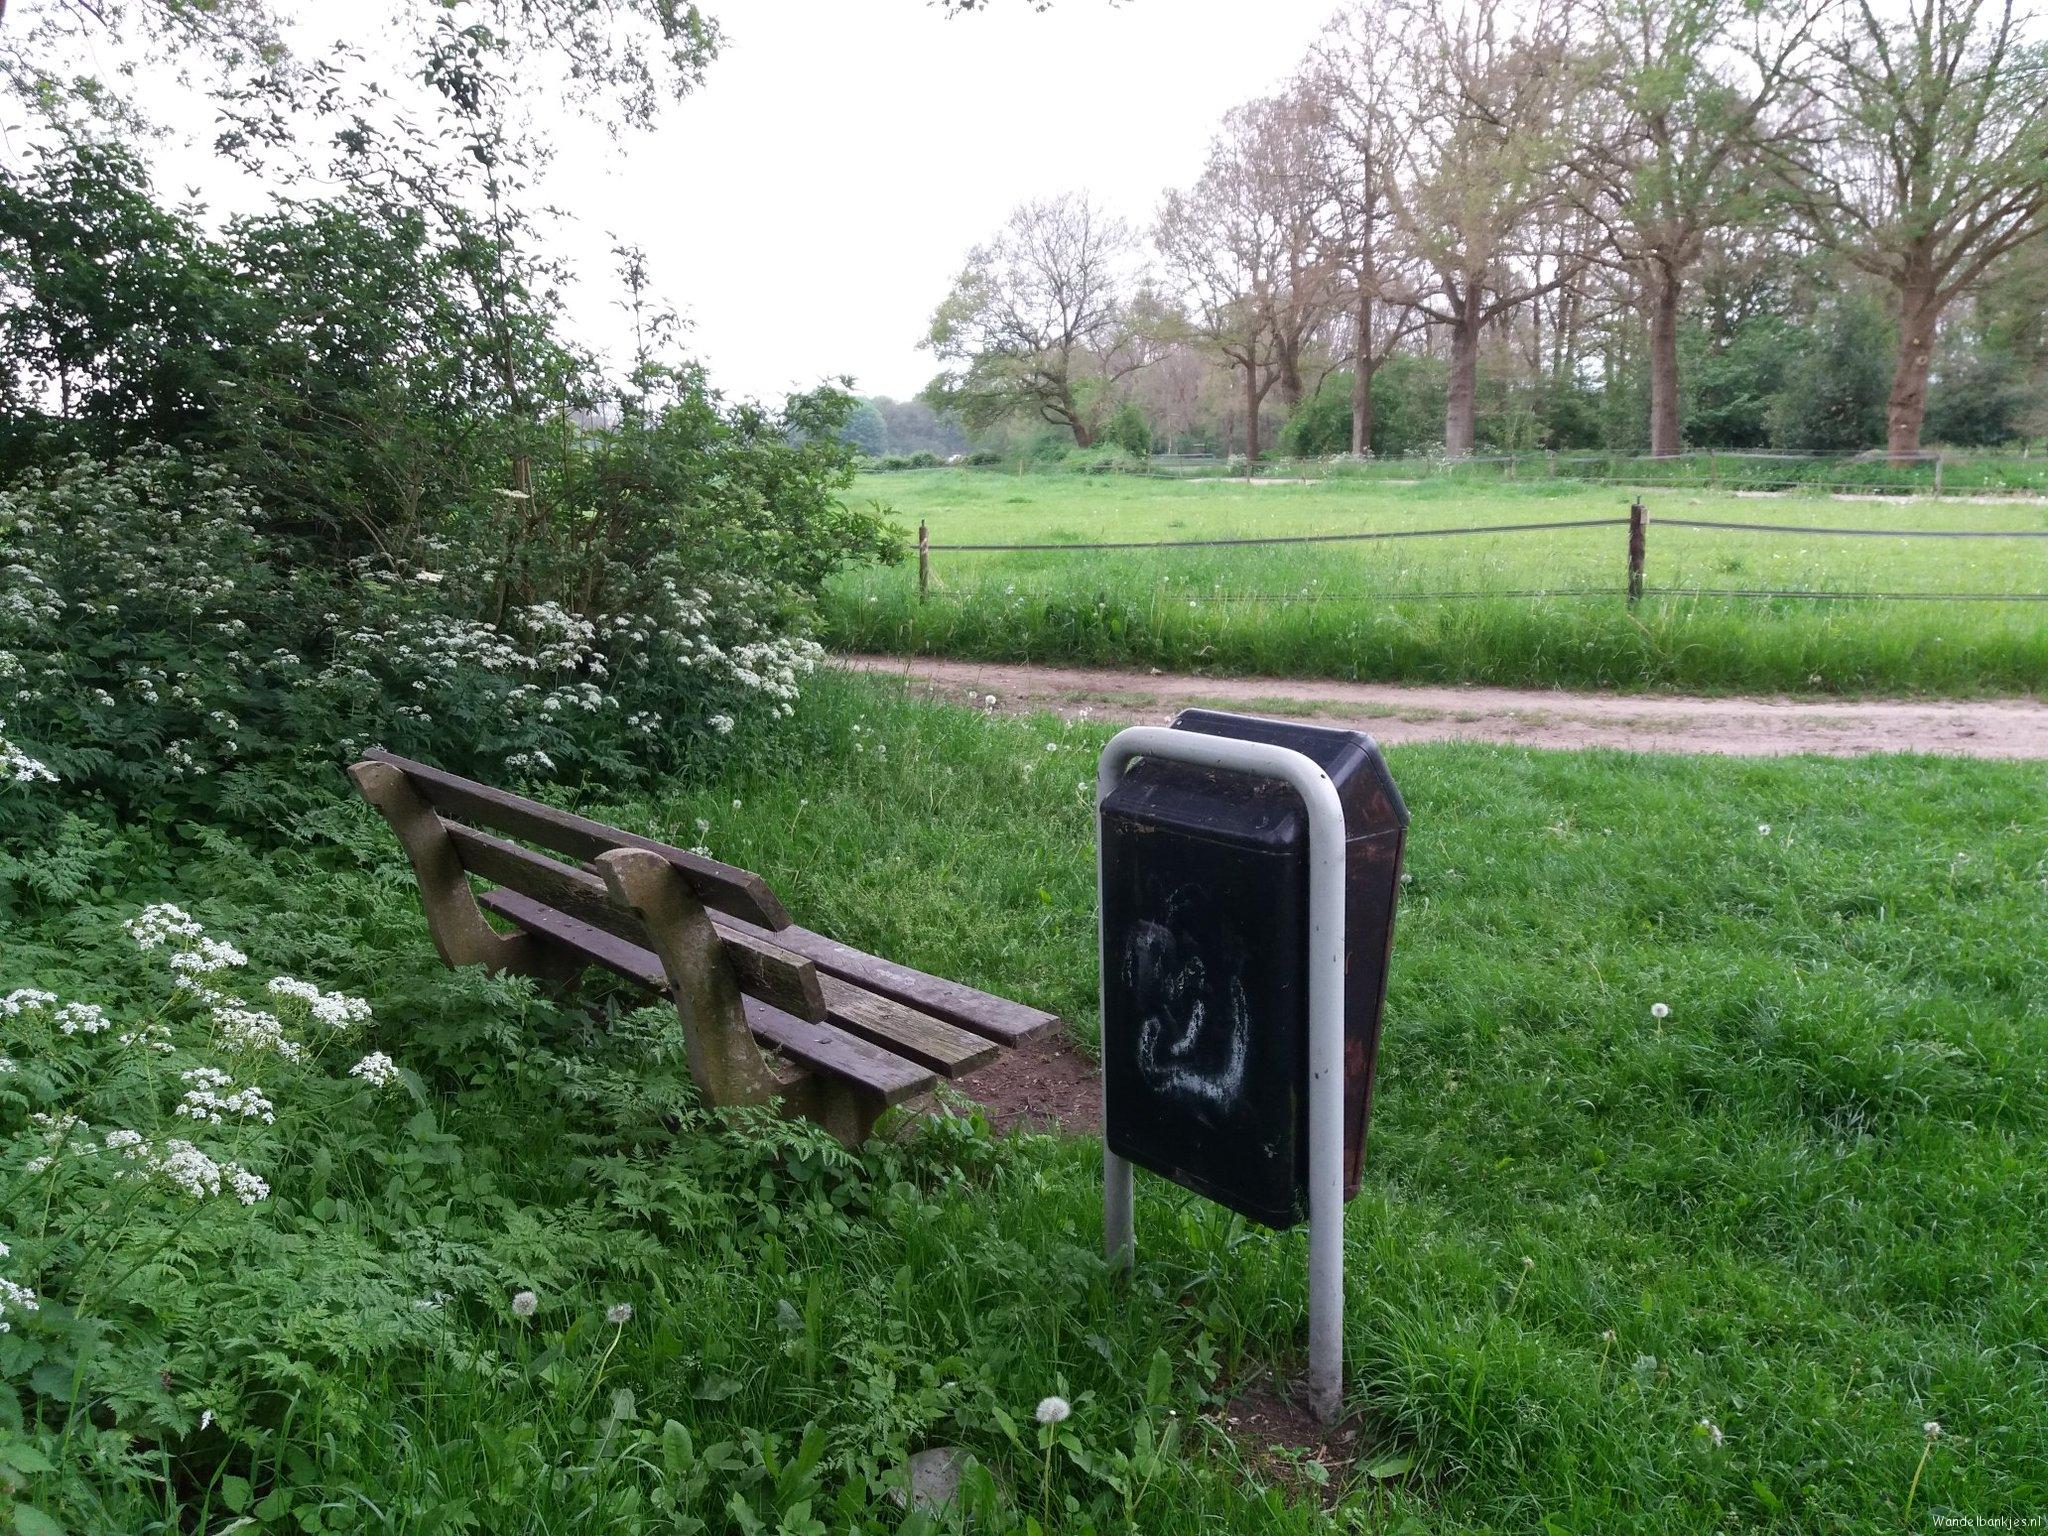 rt-walkingwithwar-walking-benches-at-the-beginning-uh-noordlaarderbos-noordlaren-prov-groningen-the-netherlands-https-t-co-jkile64gu9